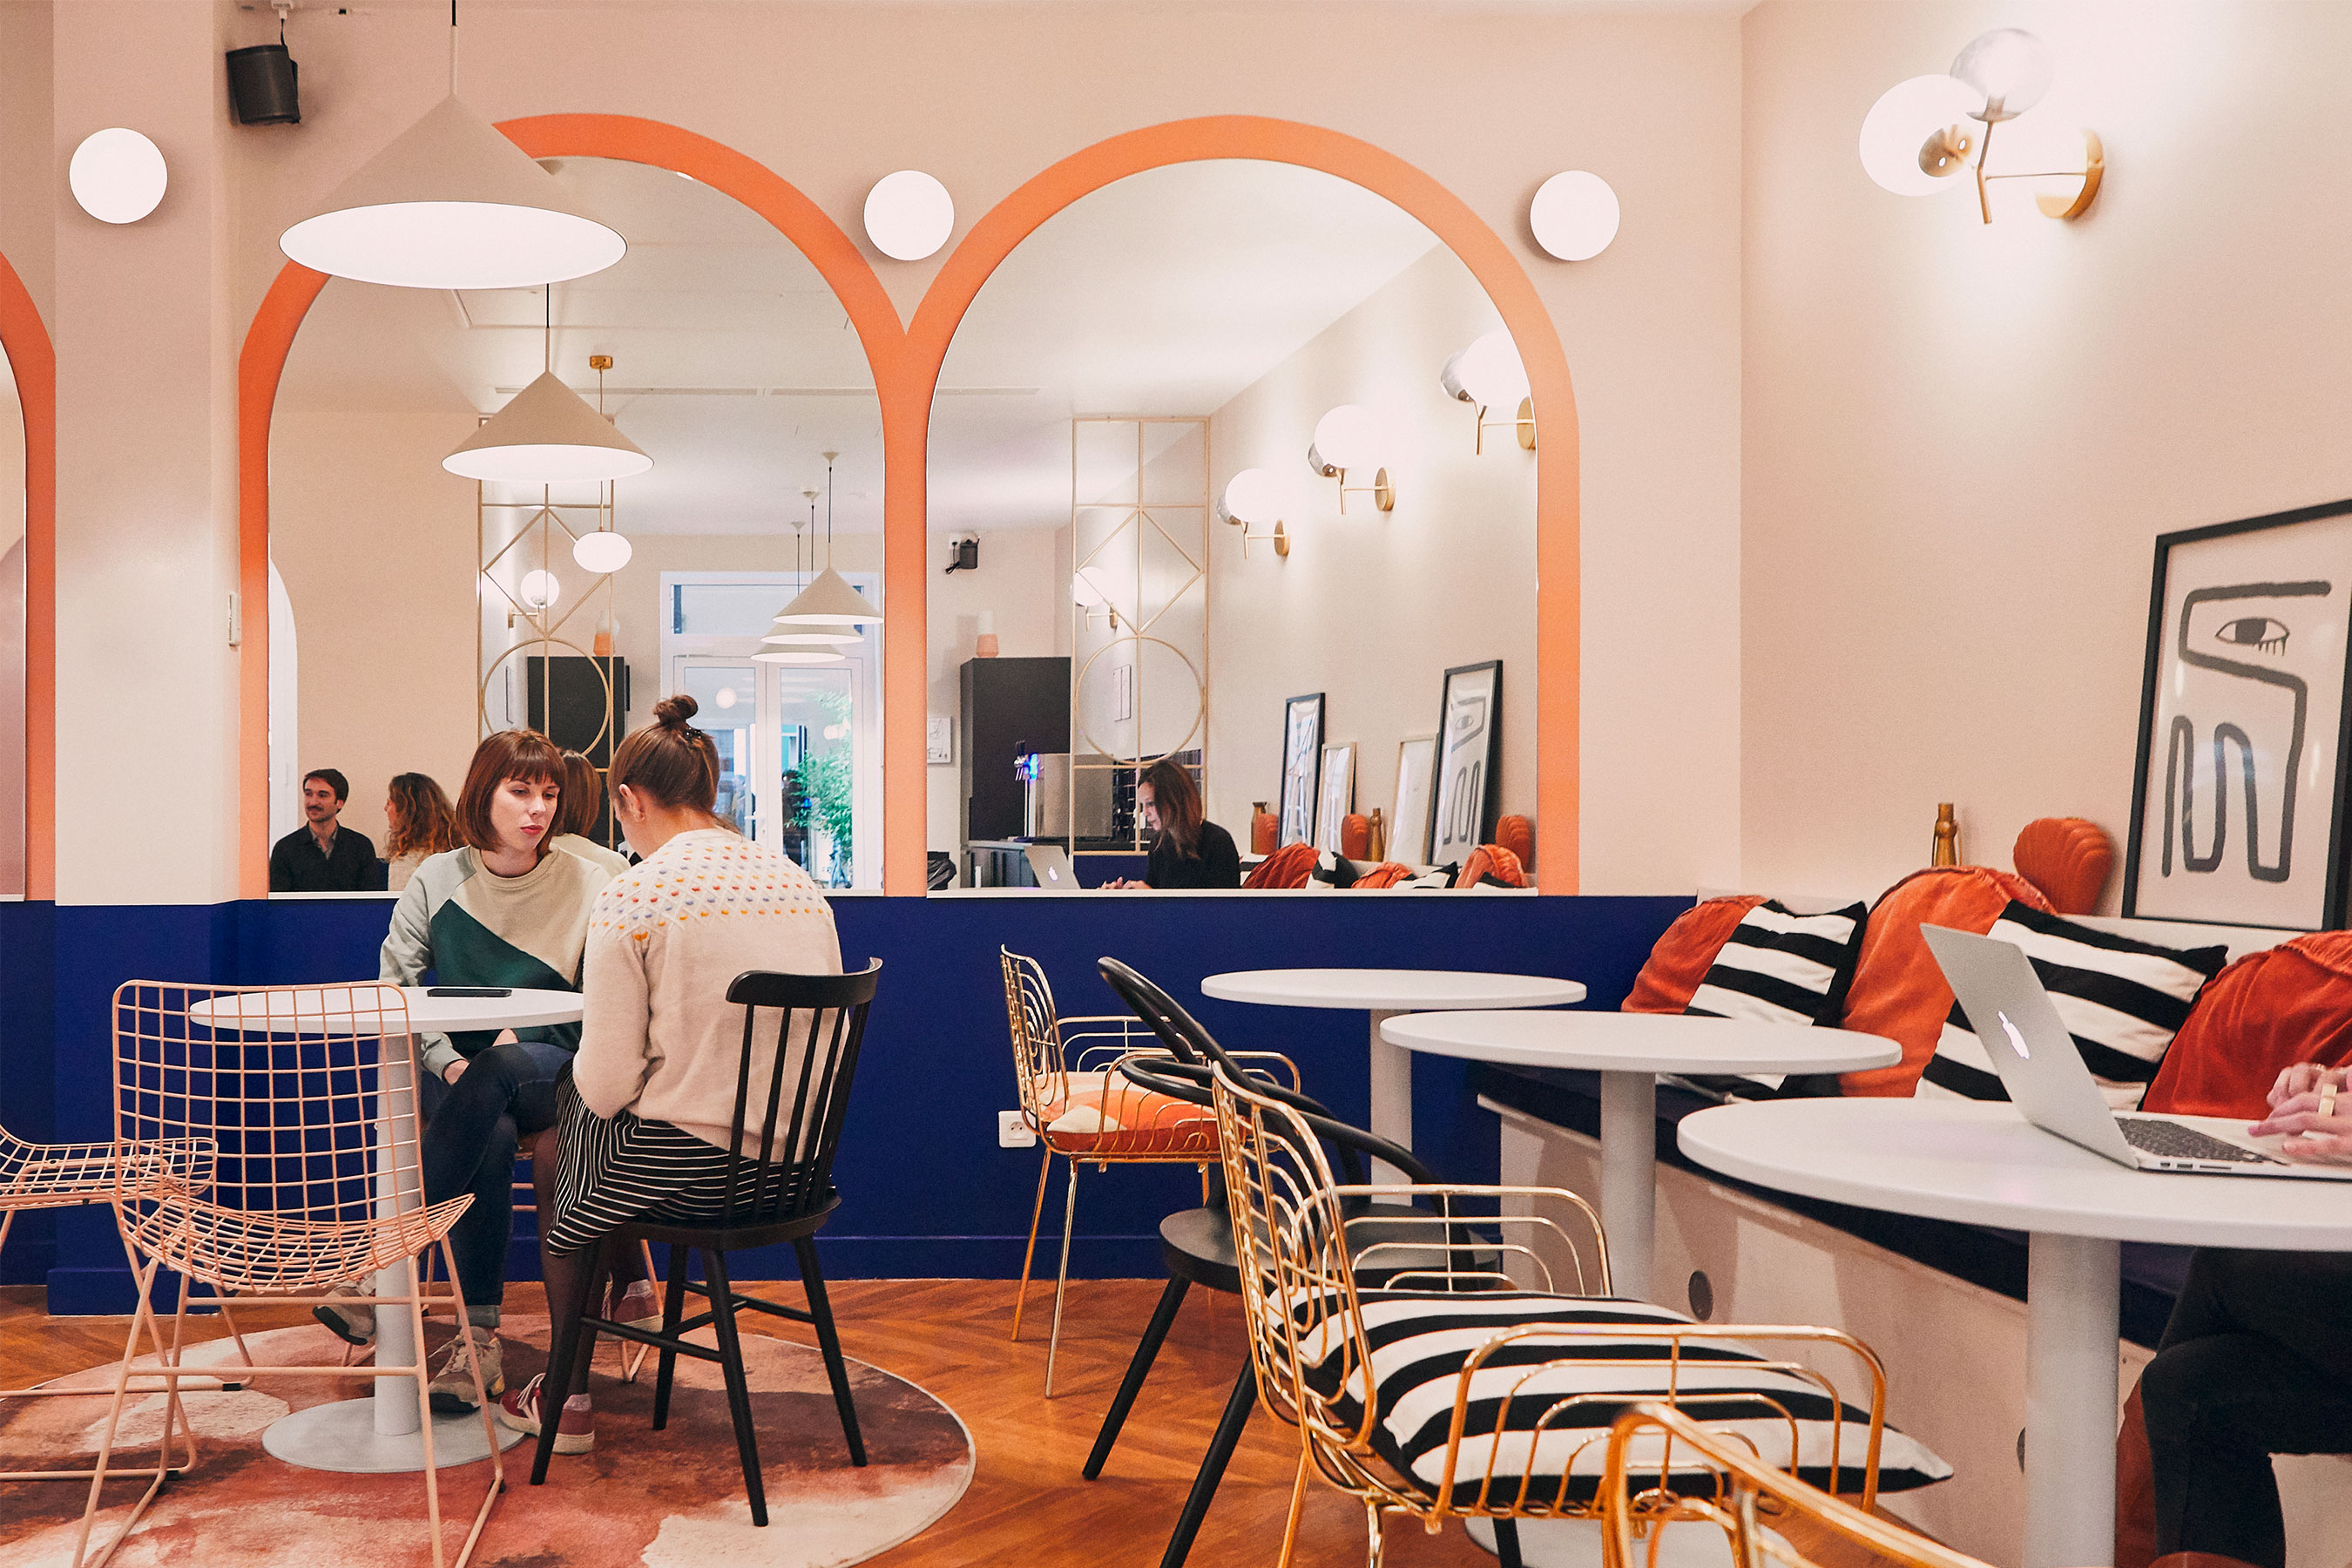 coworking Champs-Elysees - Espace commun cuisine